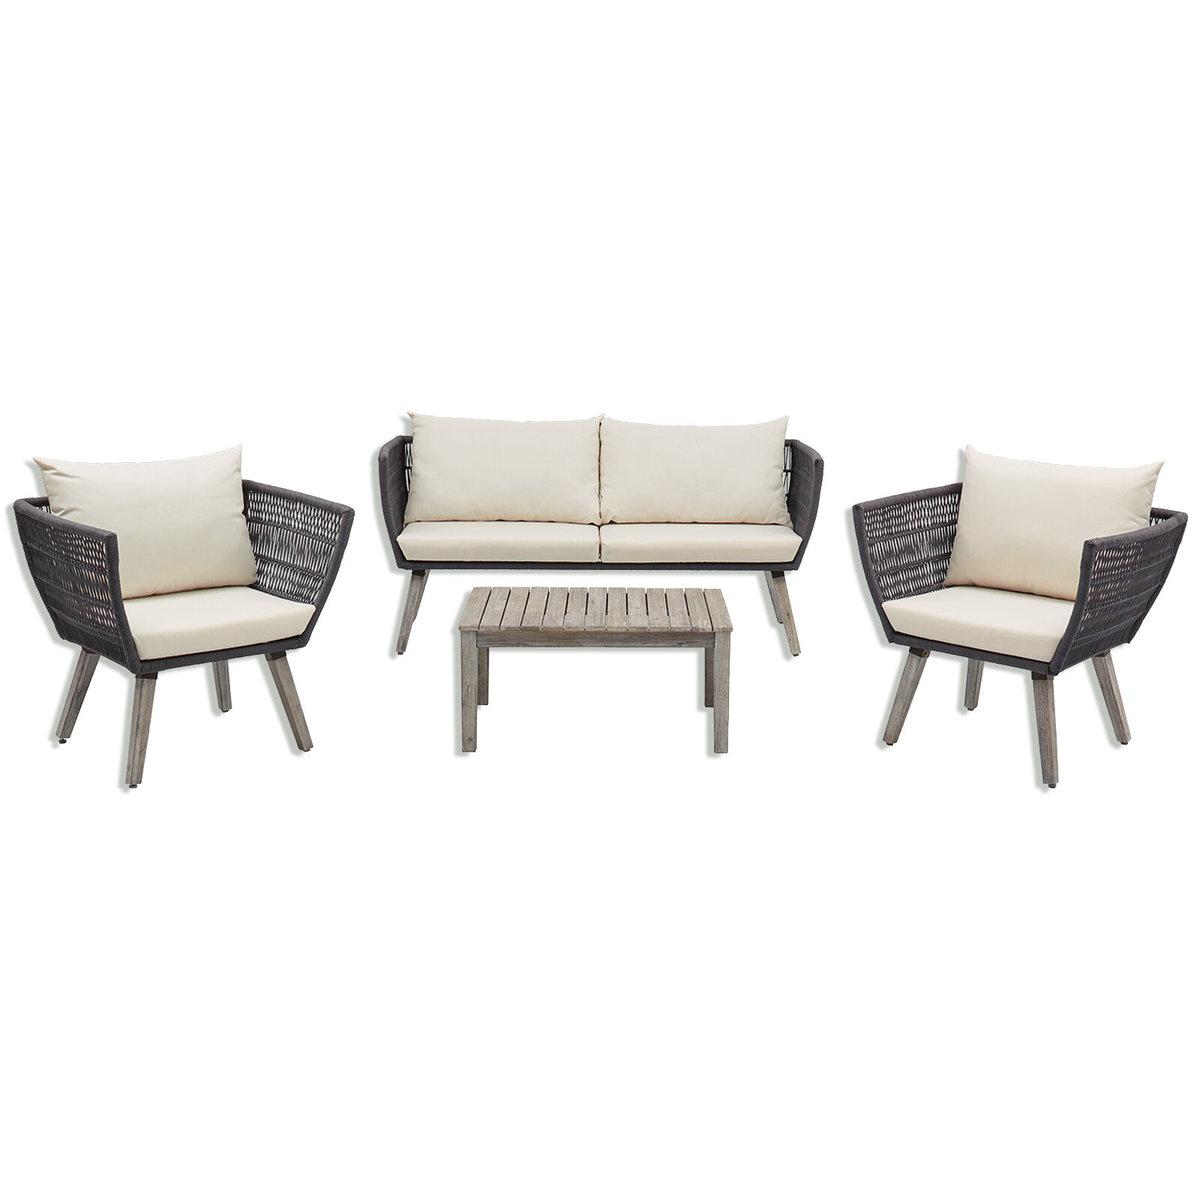 Bild 1 von Gardiola Lounge-Set SAMANA - grau - Akazie massiv